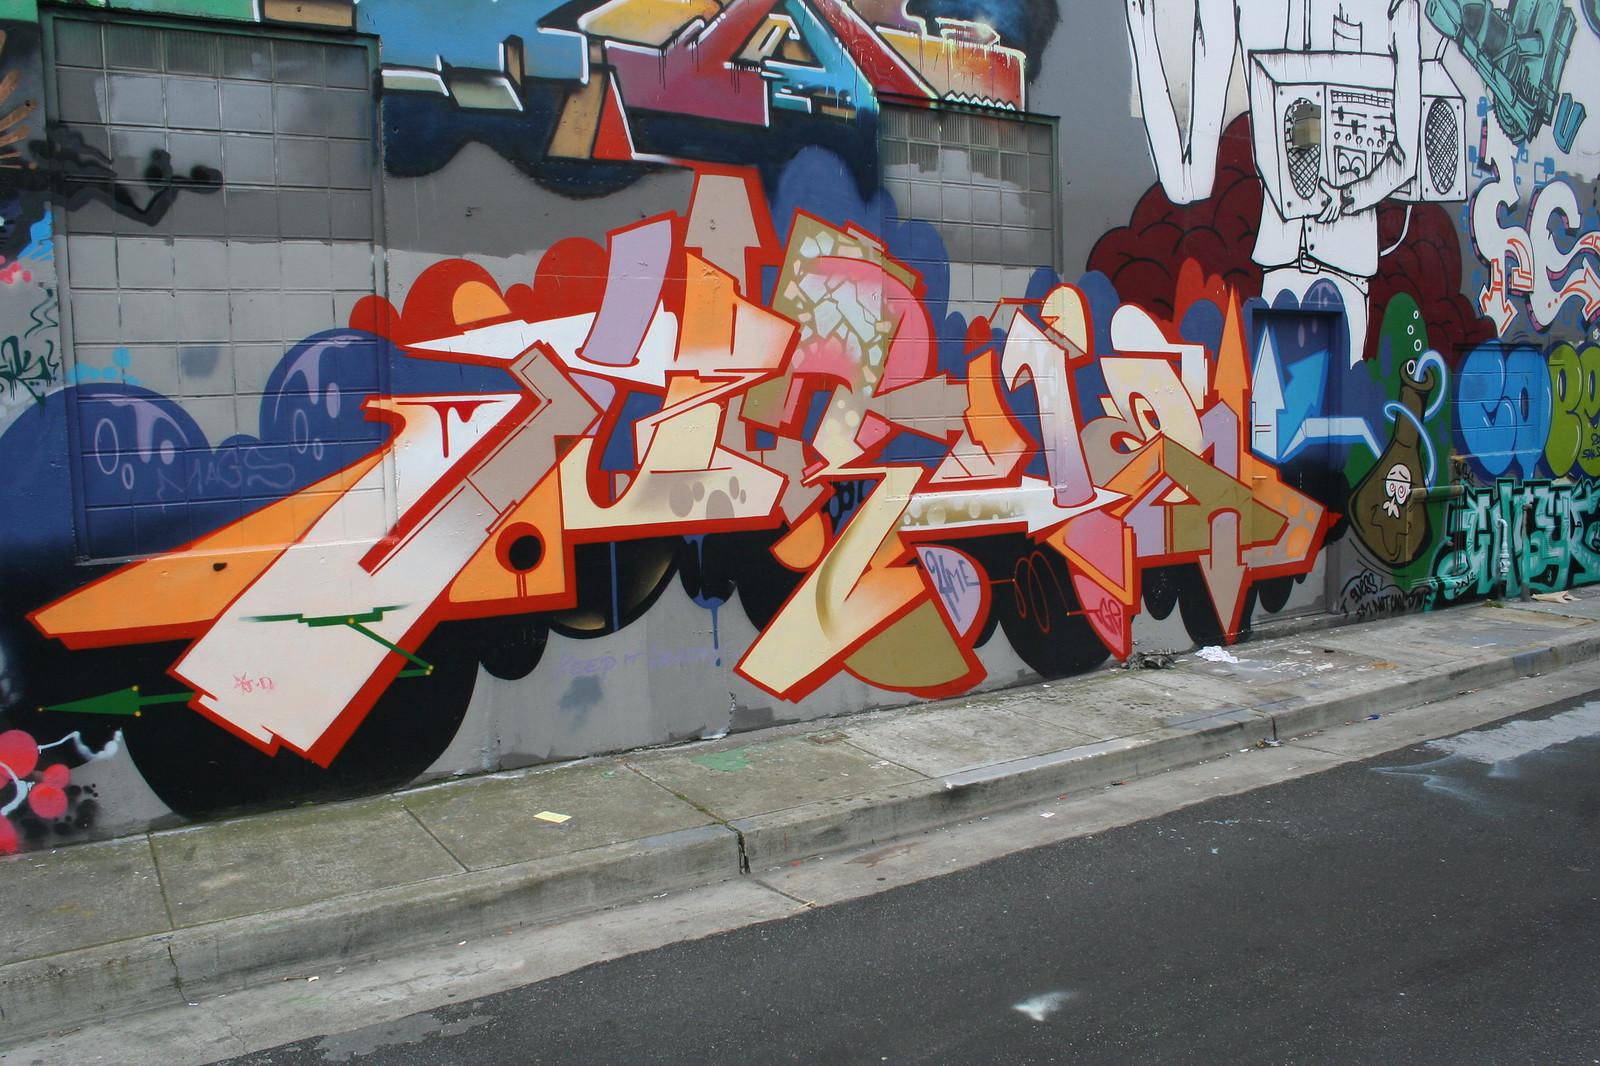 Jurne Graffiti in San Francisco